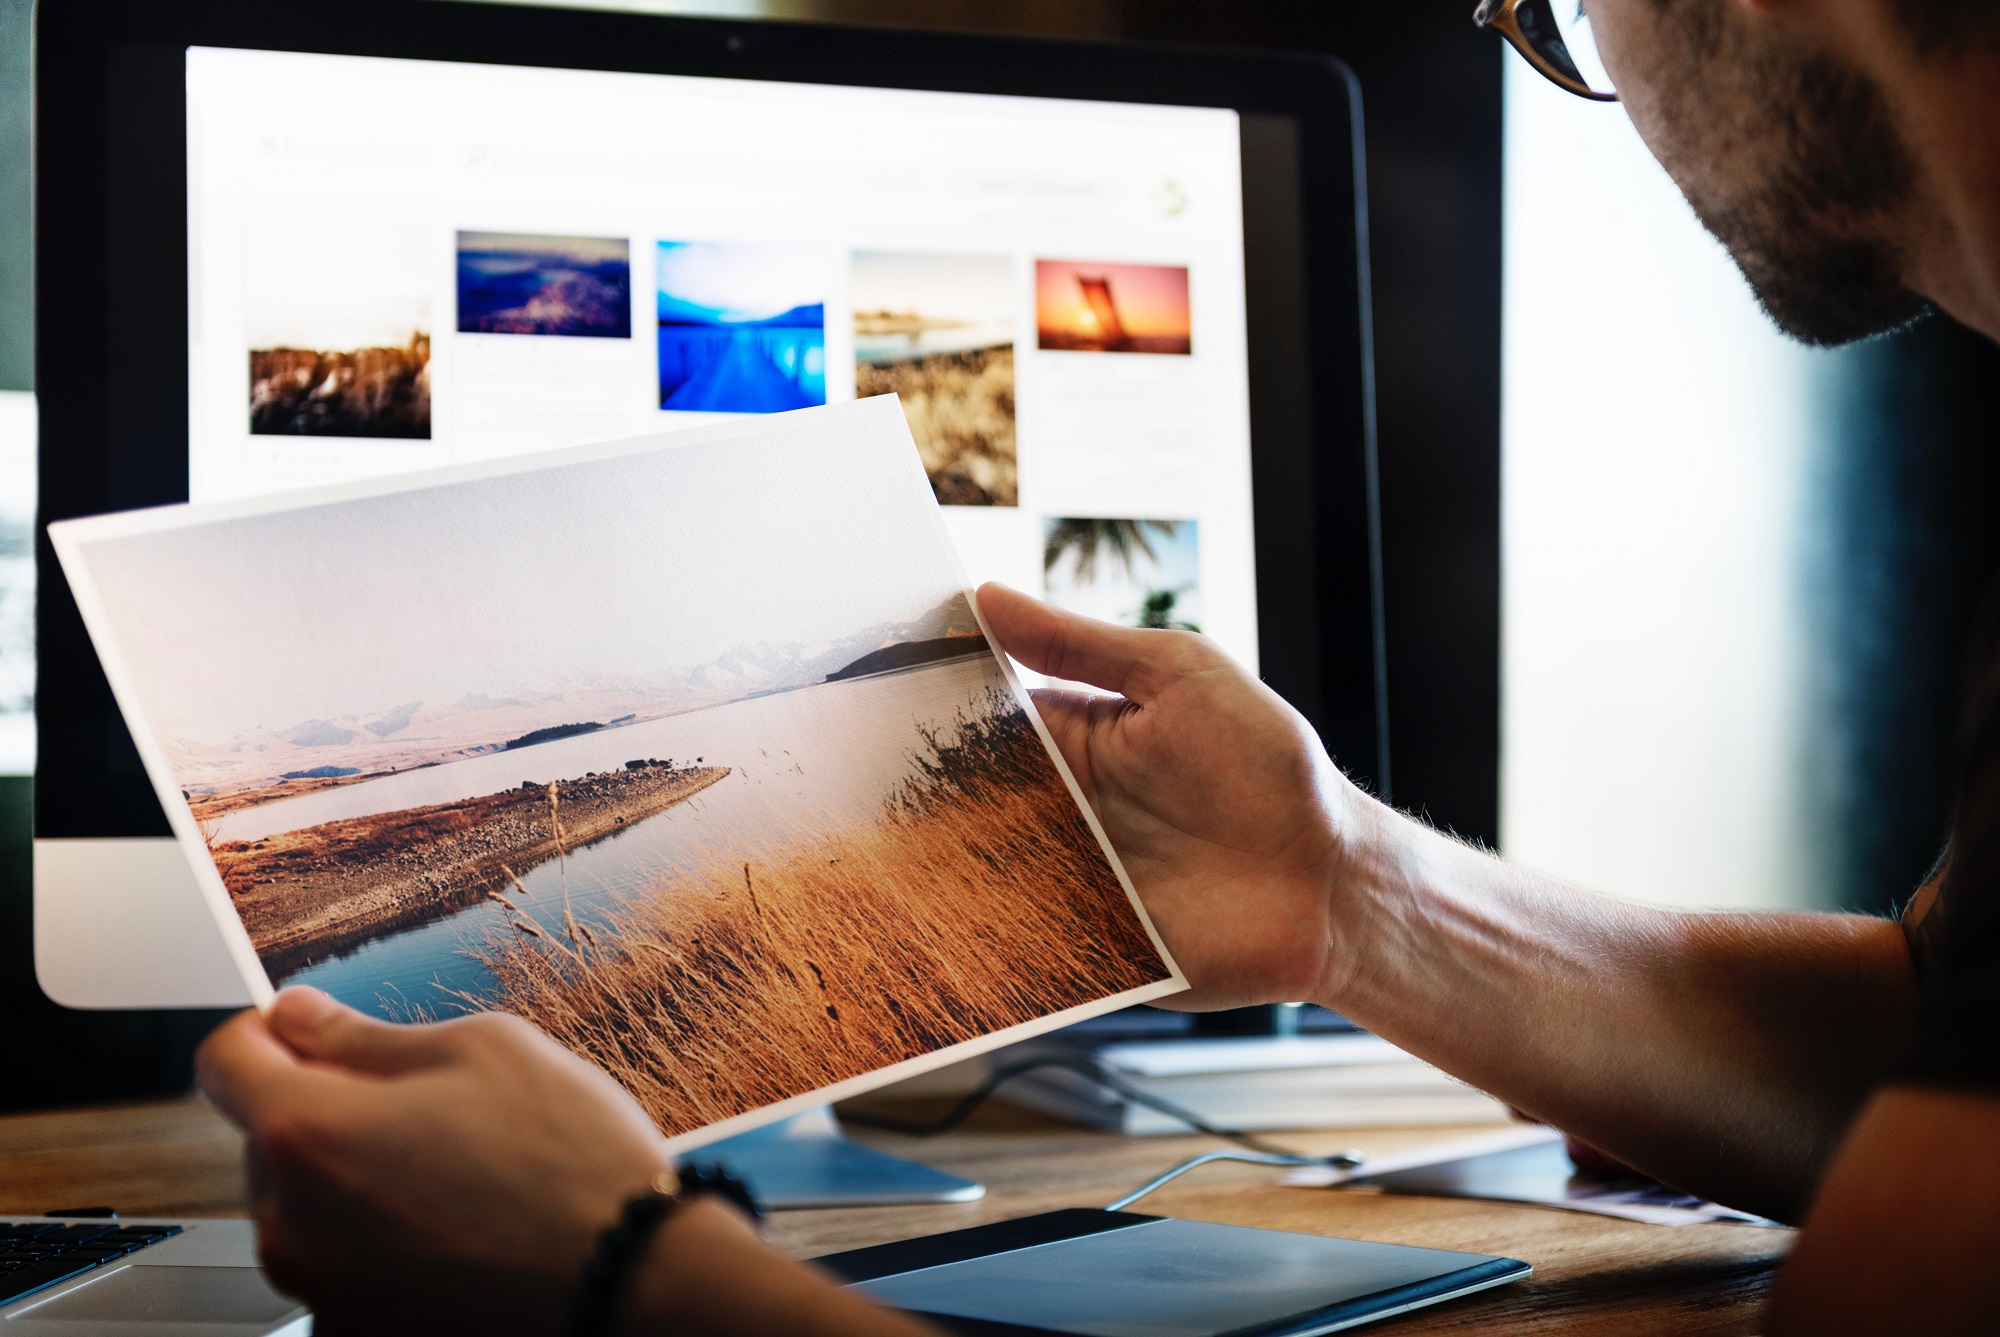 23 adobe photoshop tutorials for beginner graphic designers 23 adobe photoshop tutorials for beginner graphic designers baditri Image collections